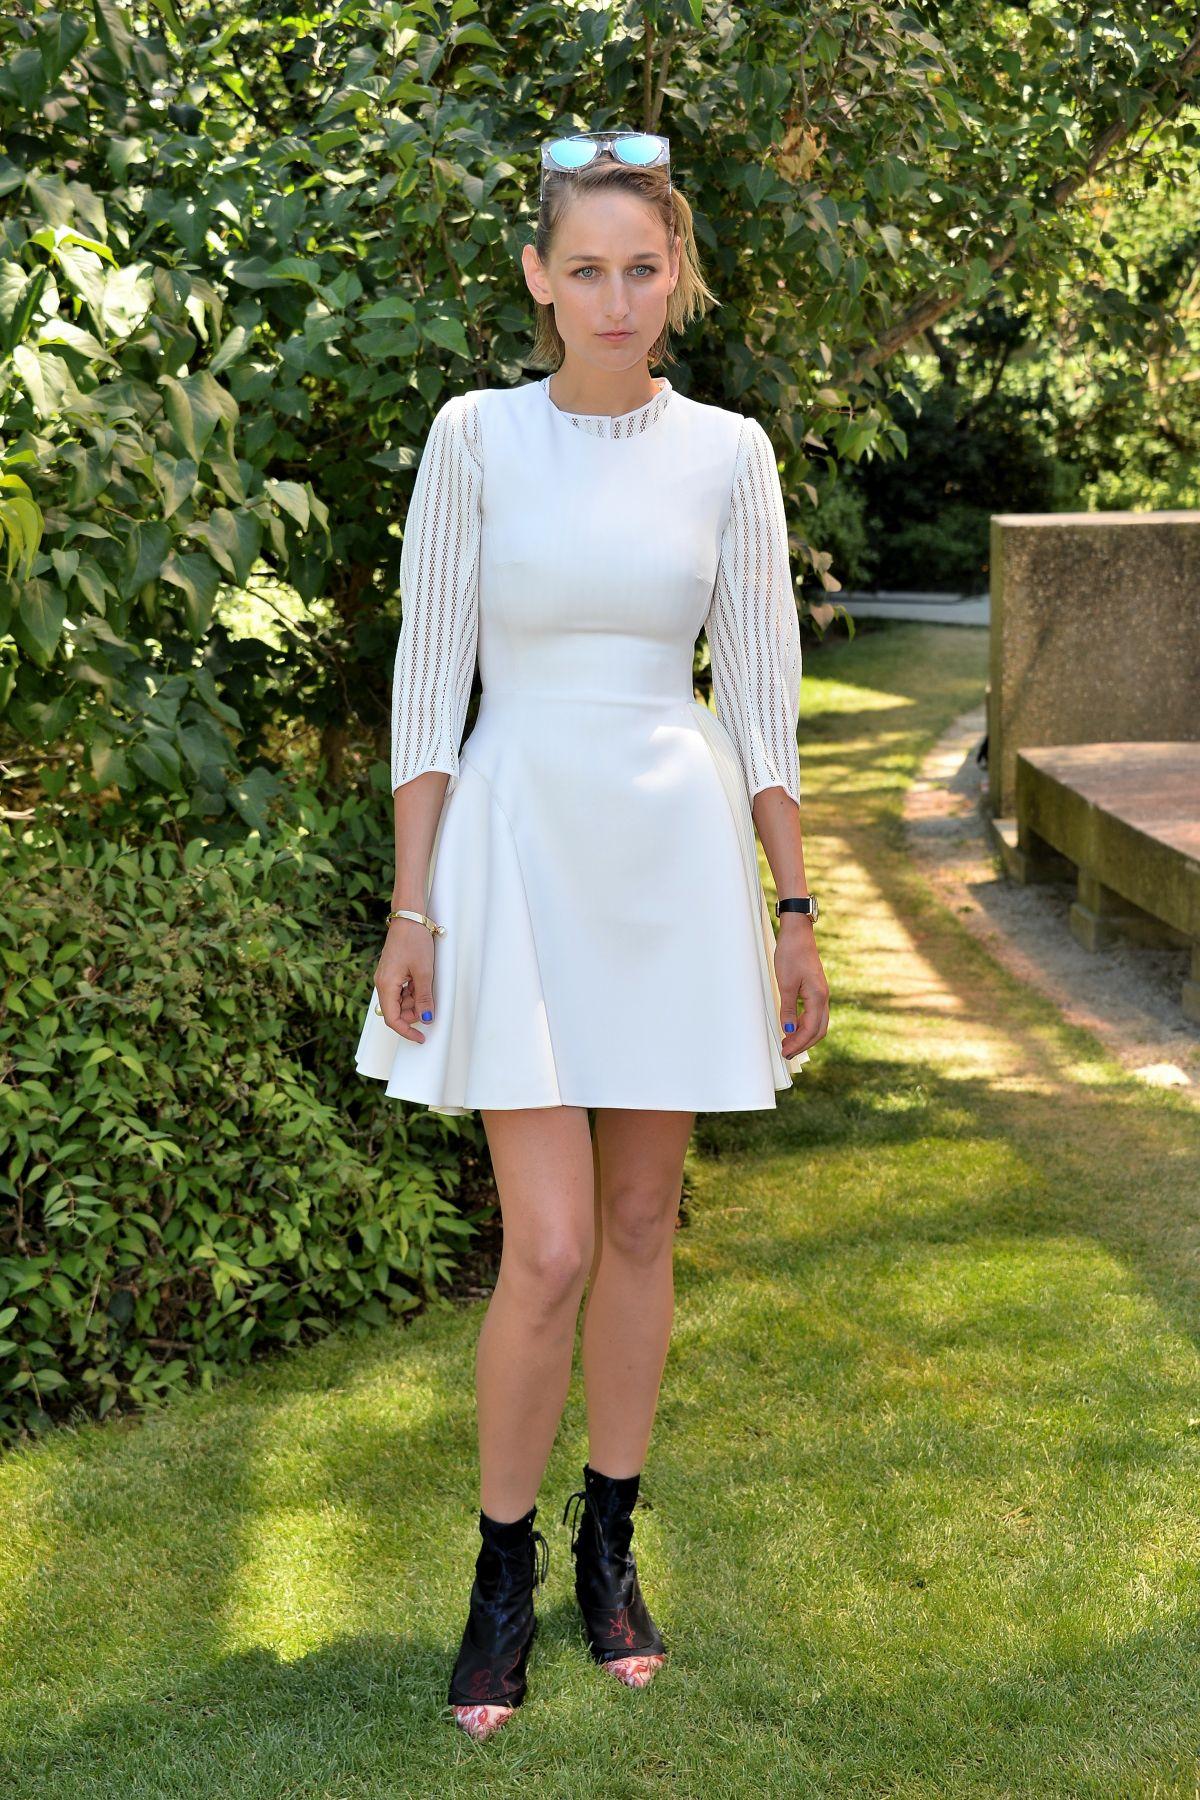 LEELEE SOBIESKIat Dior Fashion Show in Paris